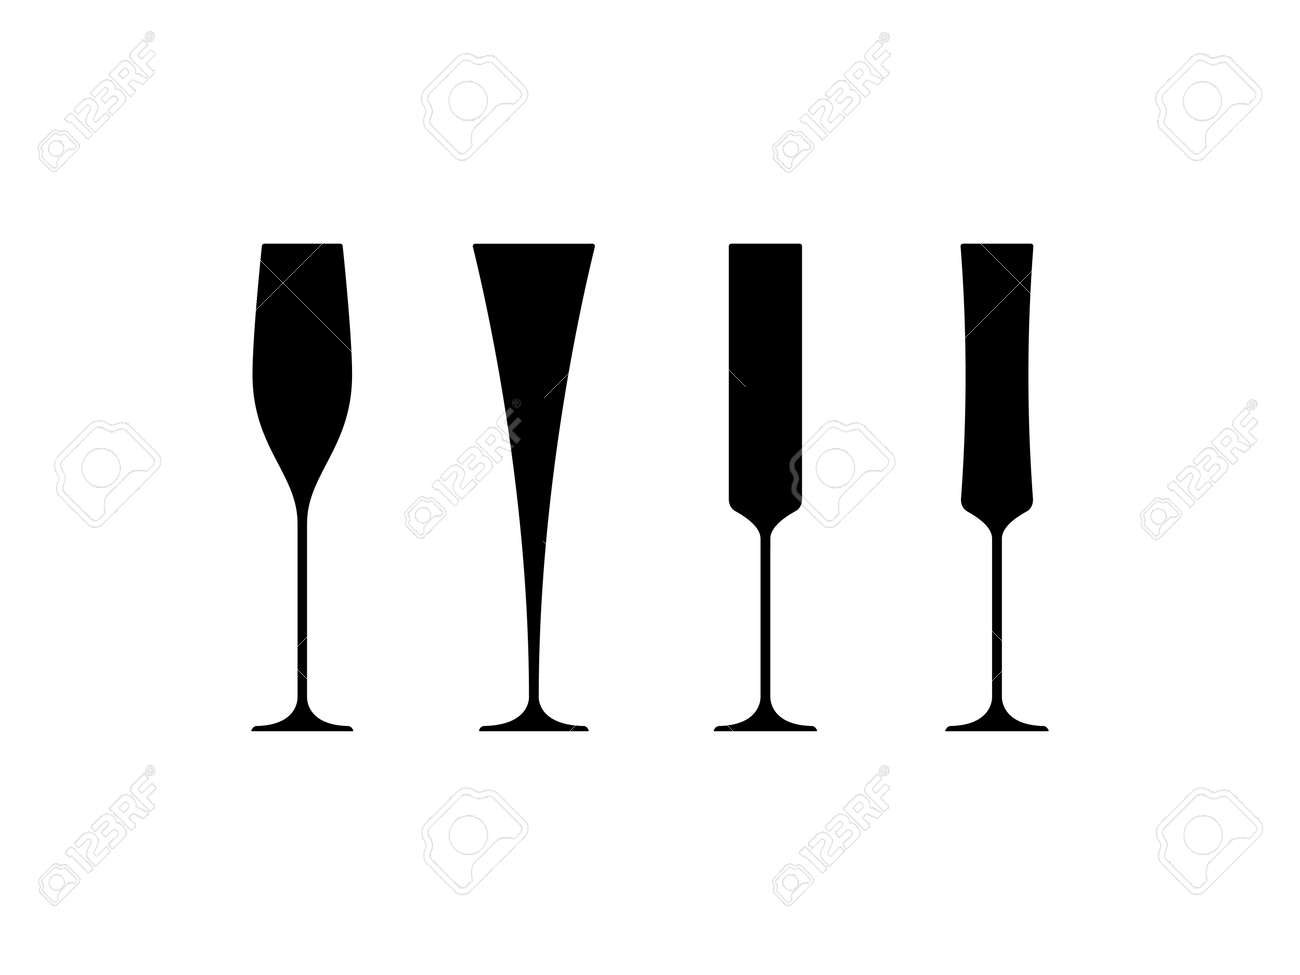 d2754303d9b Champagne Glasses Black Silhouette. Royalty Free Cliparts, Vectors ...